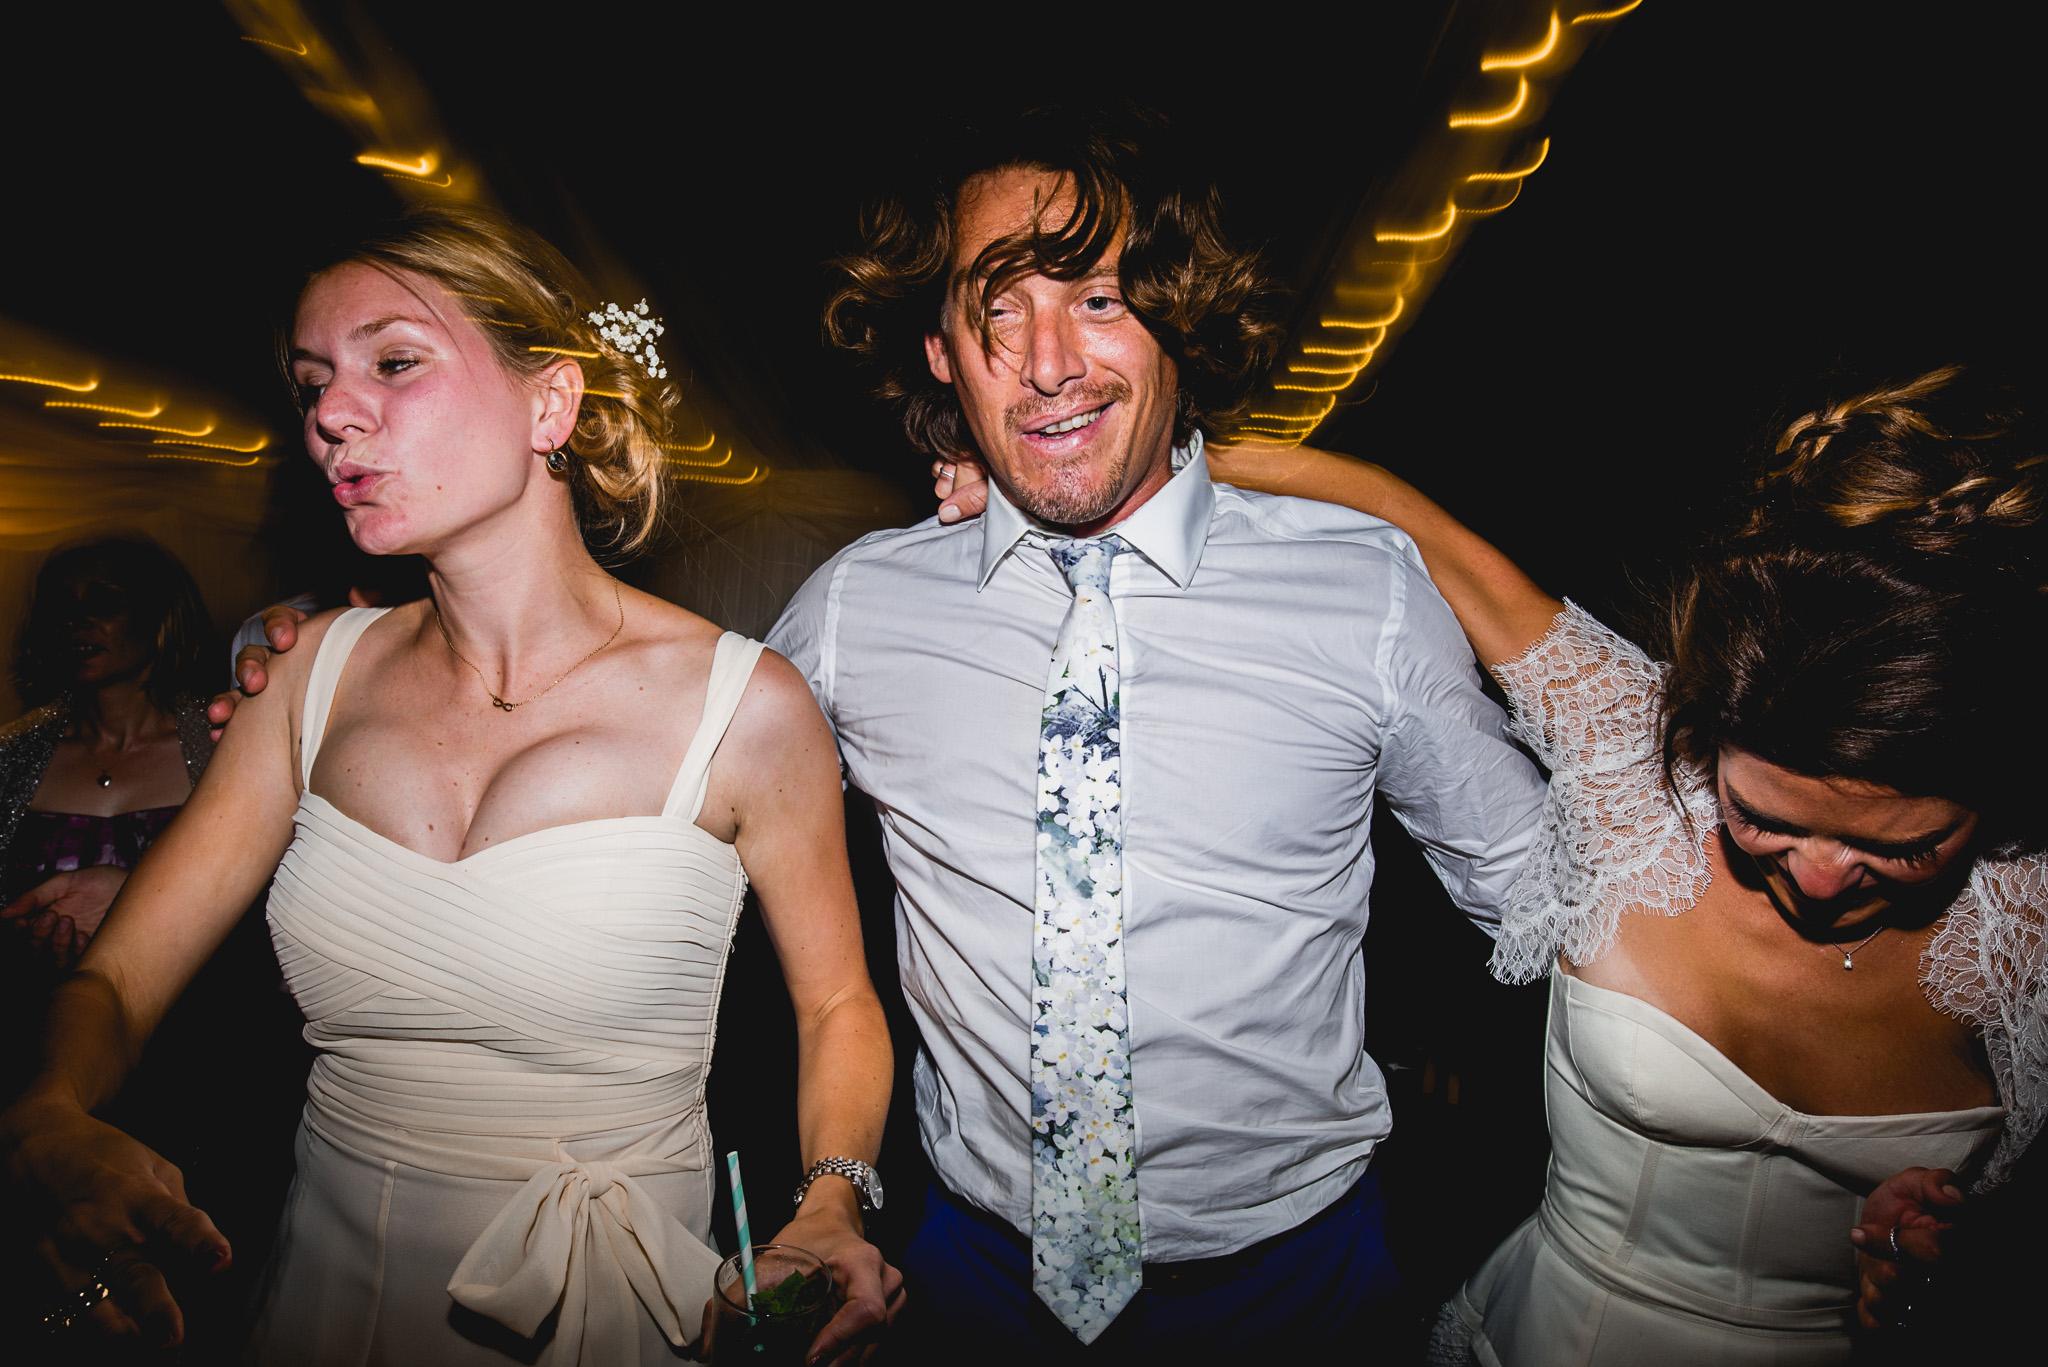 Lara & Jack Wedding 220815 by Barney Walters_1072_BW2_1170